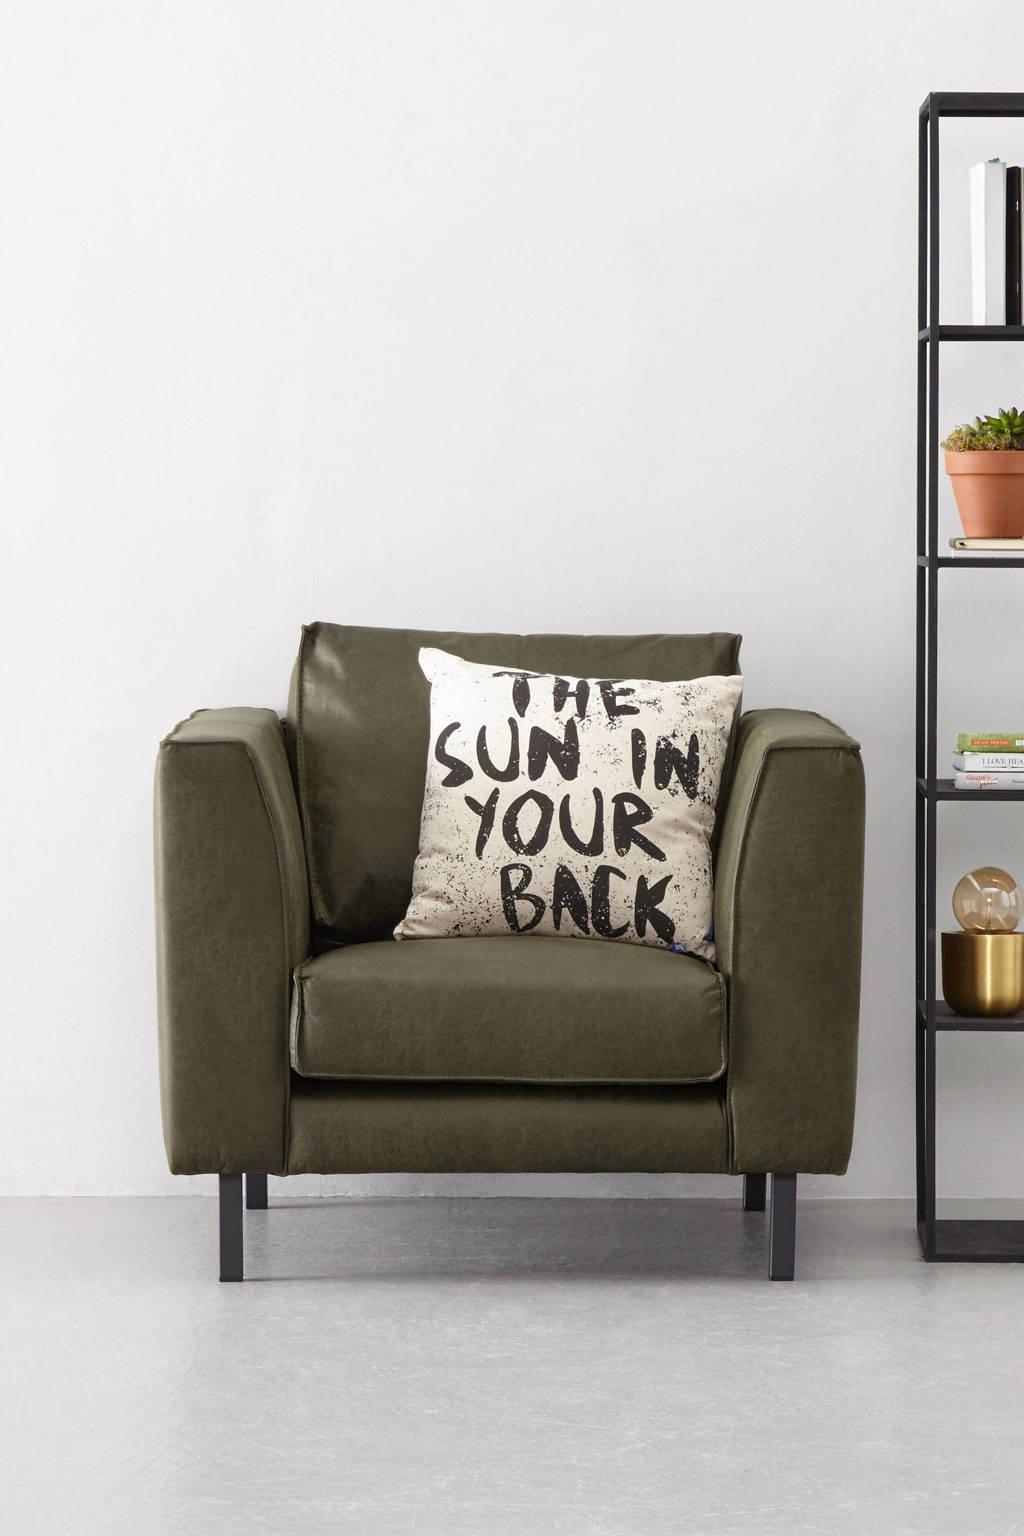 whkmp's own eco-leren fauteuil Rio, Donkergroen